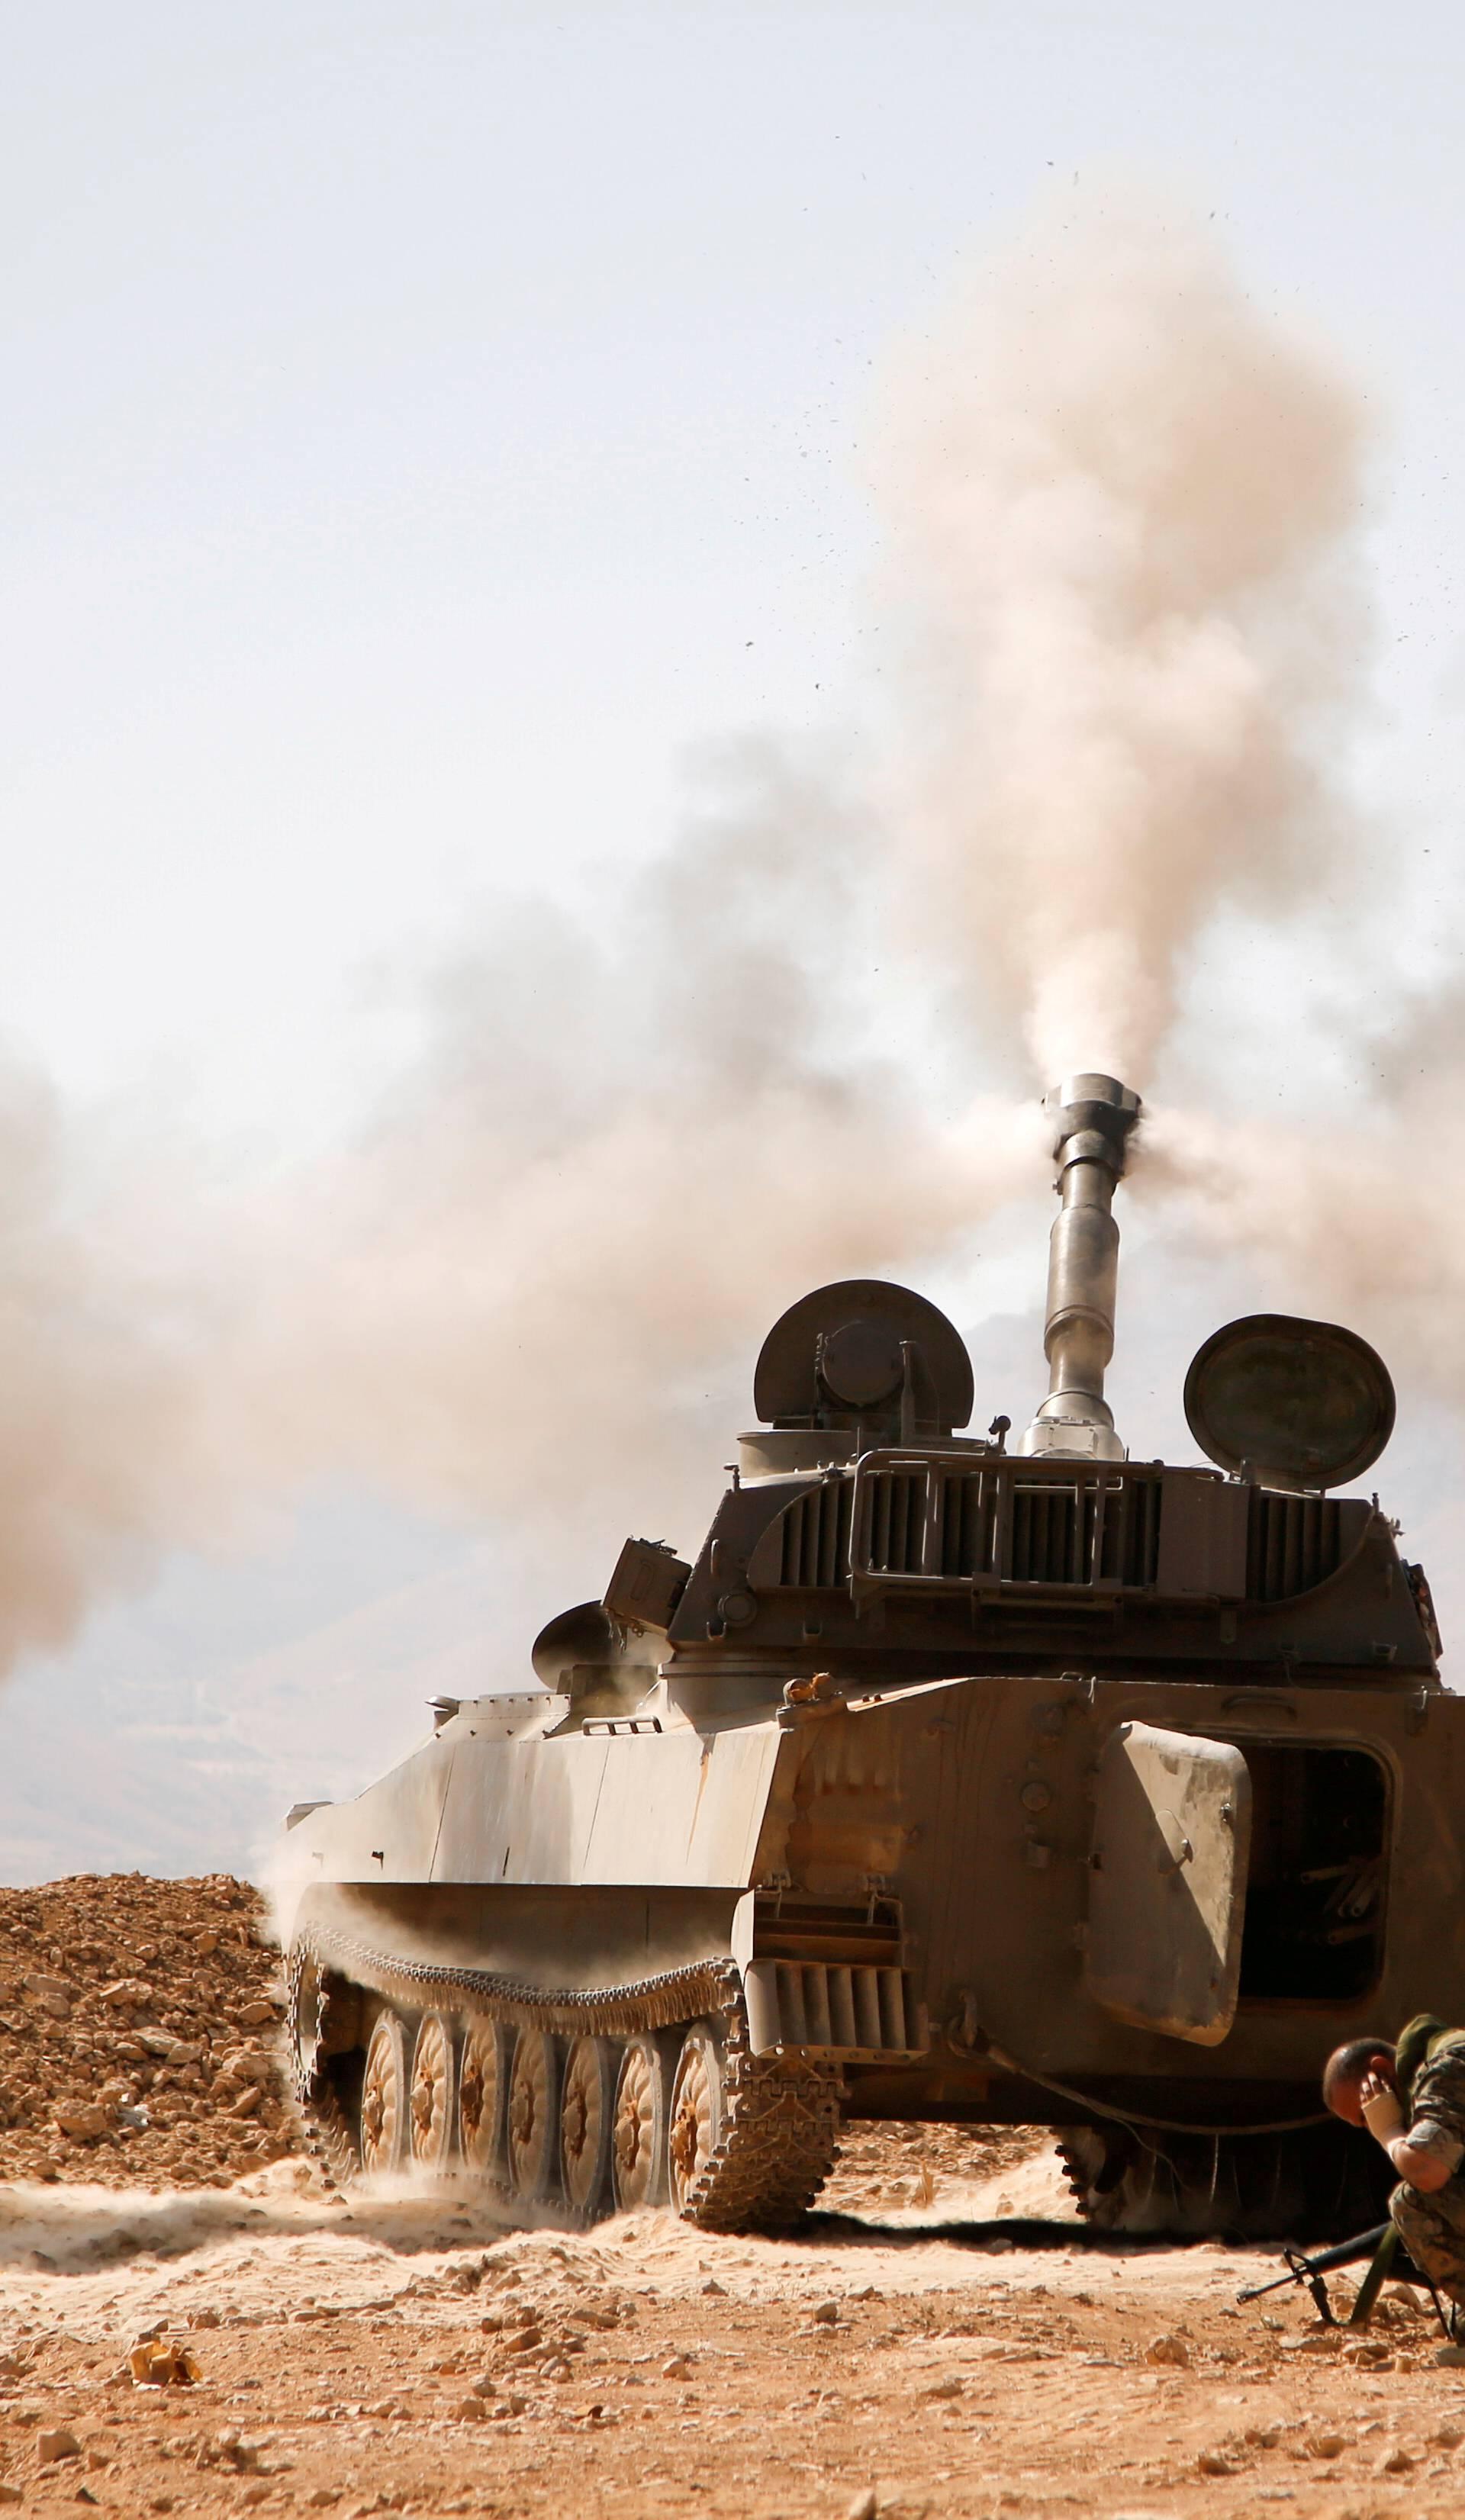 Izrael je žestoko bombardirao Siriju: 'Napadamo terorizam'